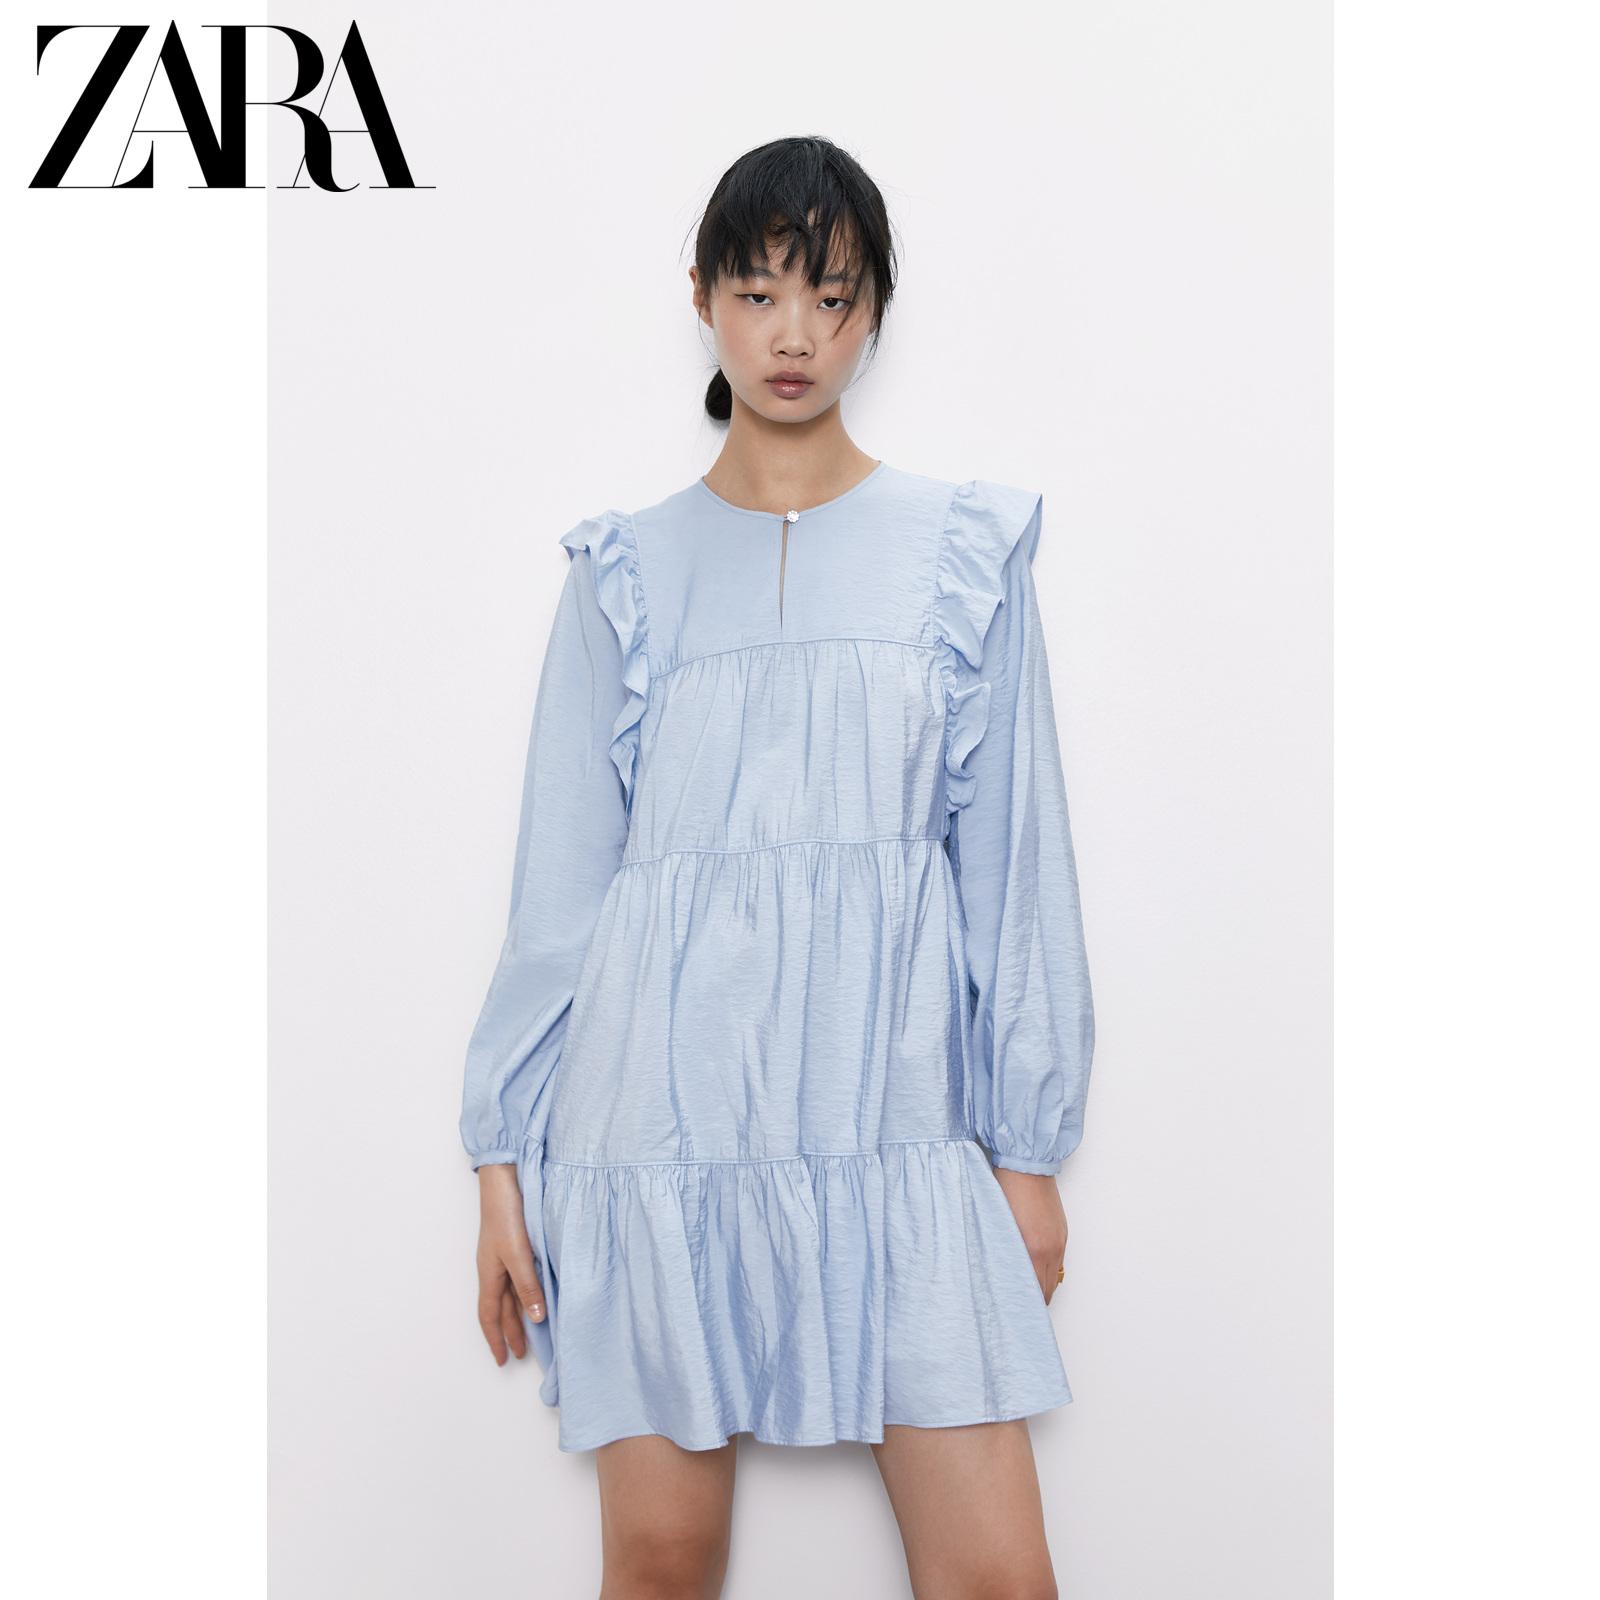 ZARA女装 珠宝纽扣连衣裙 08514056400